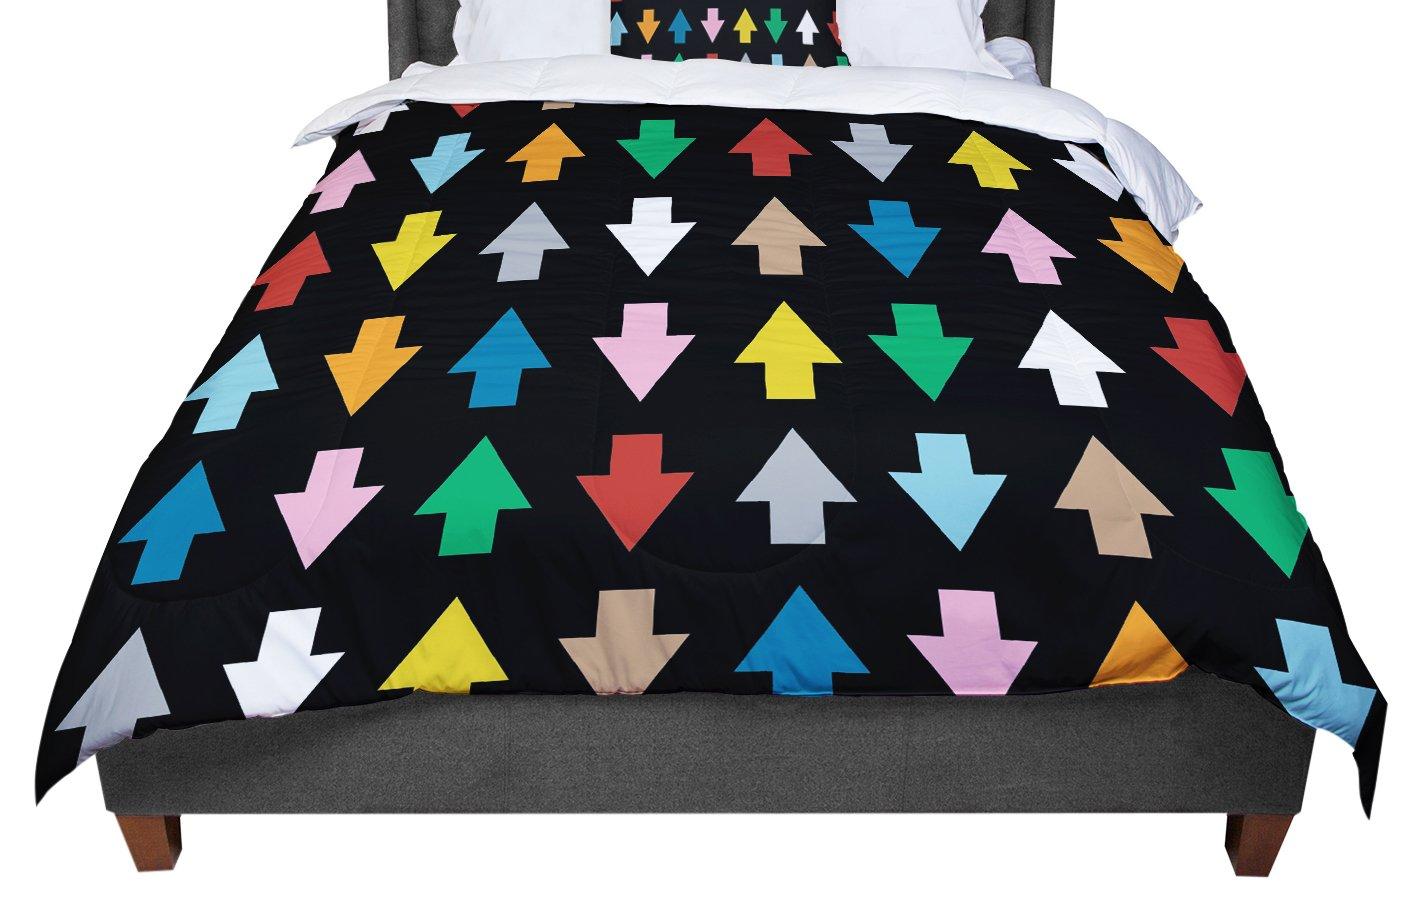 KESS InHouse Project M Arrows Up /& Down Black Twin Comforter 68 X 88